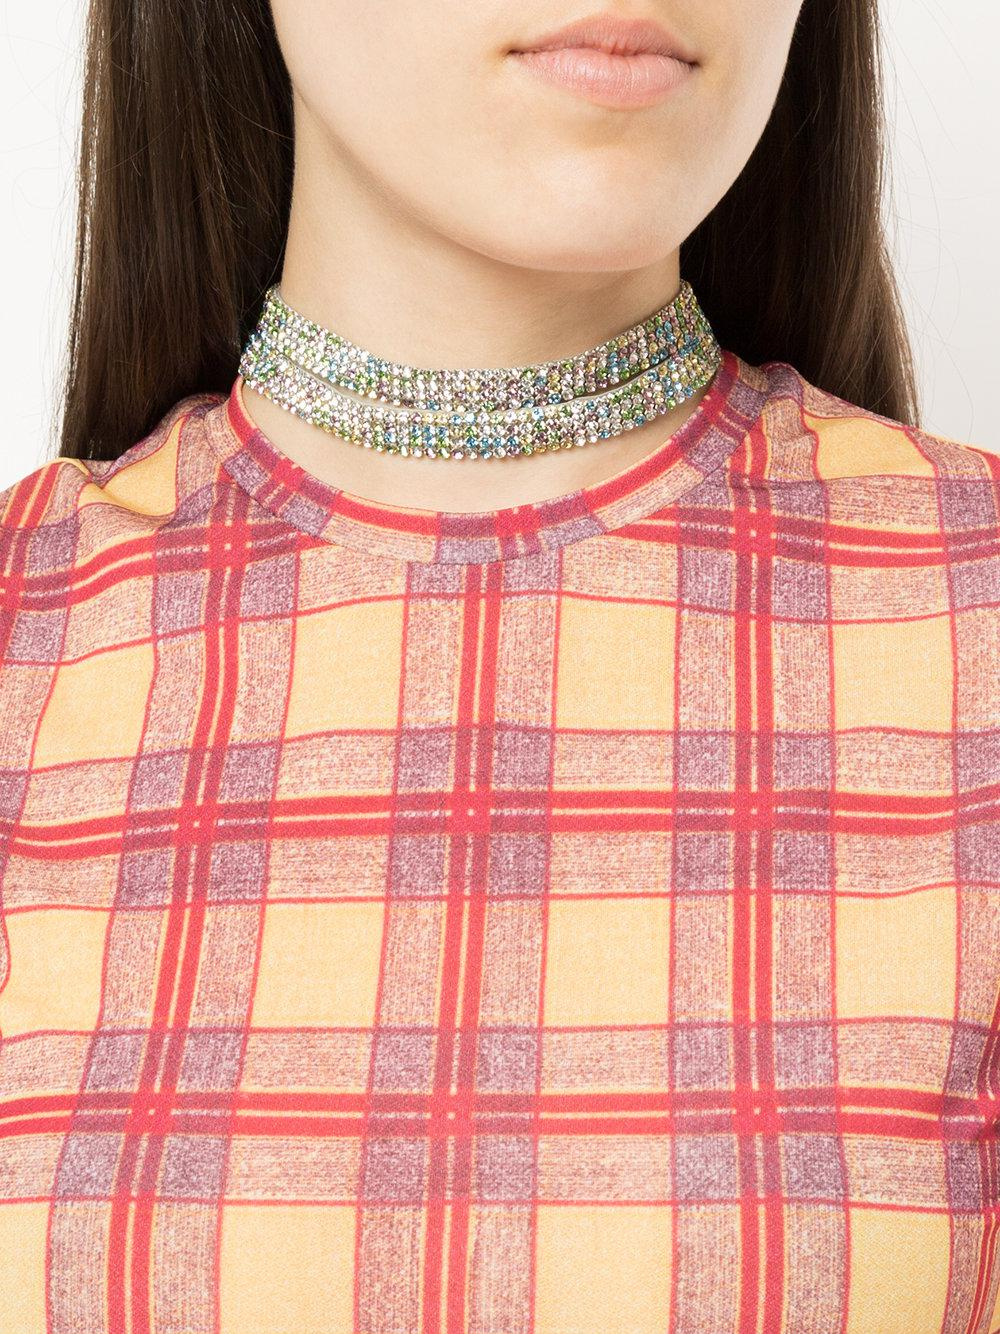 We11done embellished double strap choker - Metallic 9tH5N8Nw